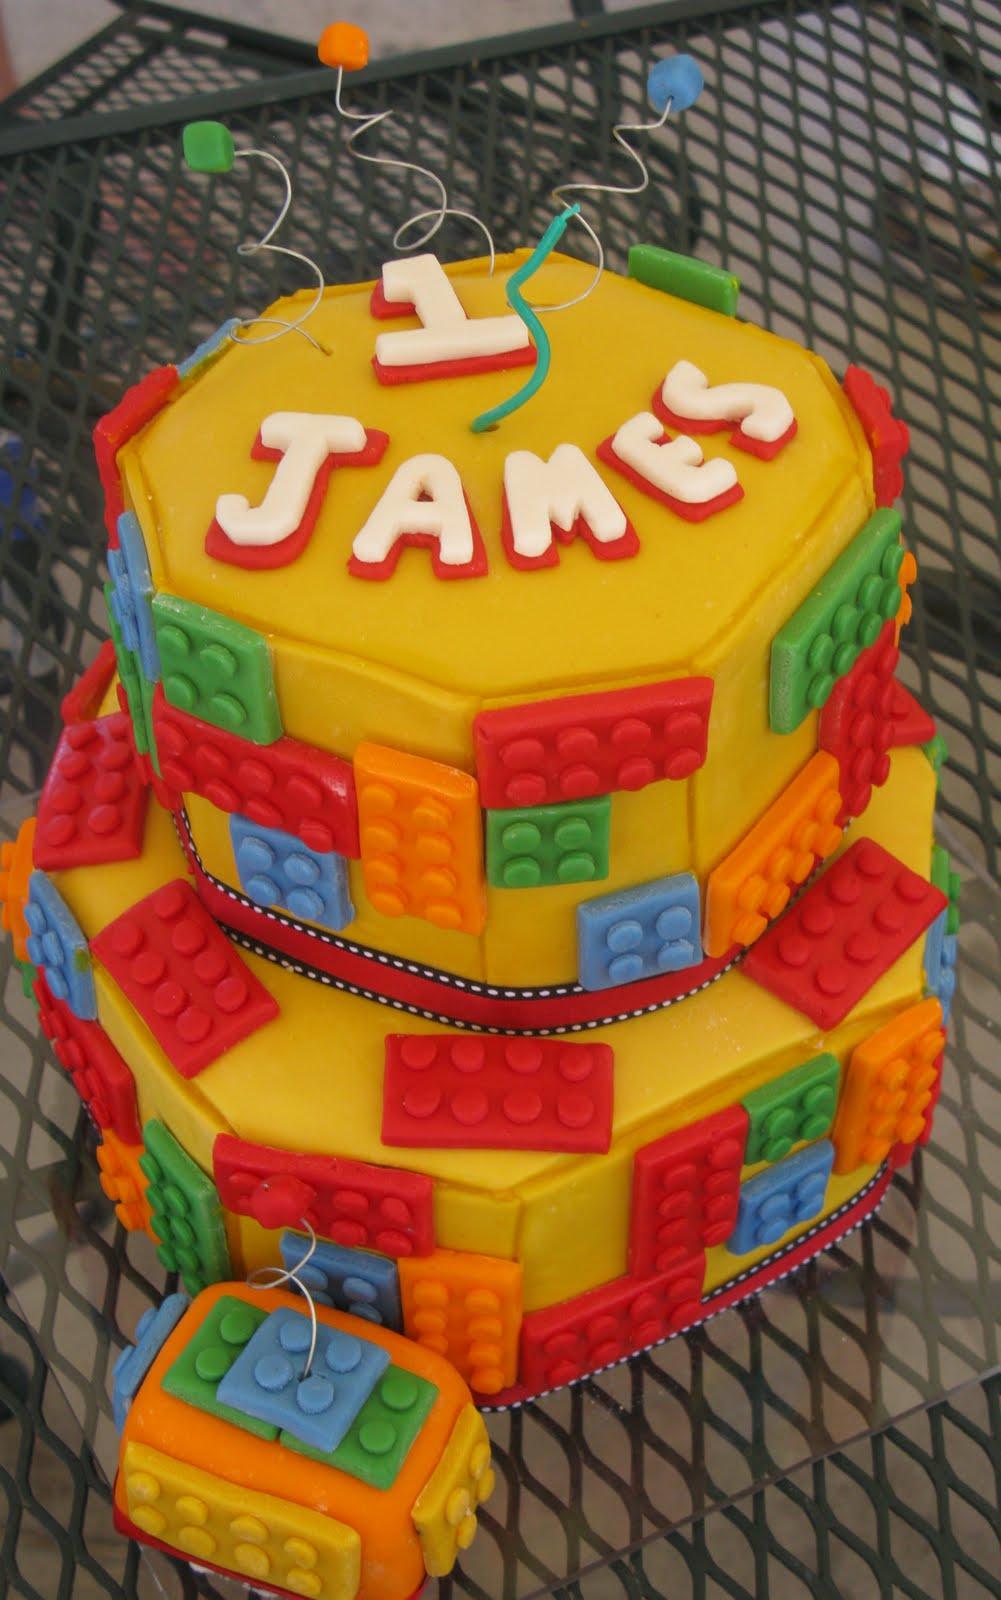 Art thou edible happy birthday james happy birthday james thecheapjerseys Images